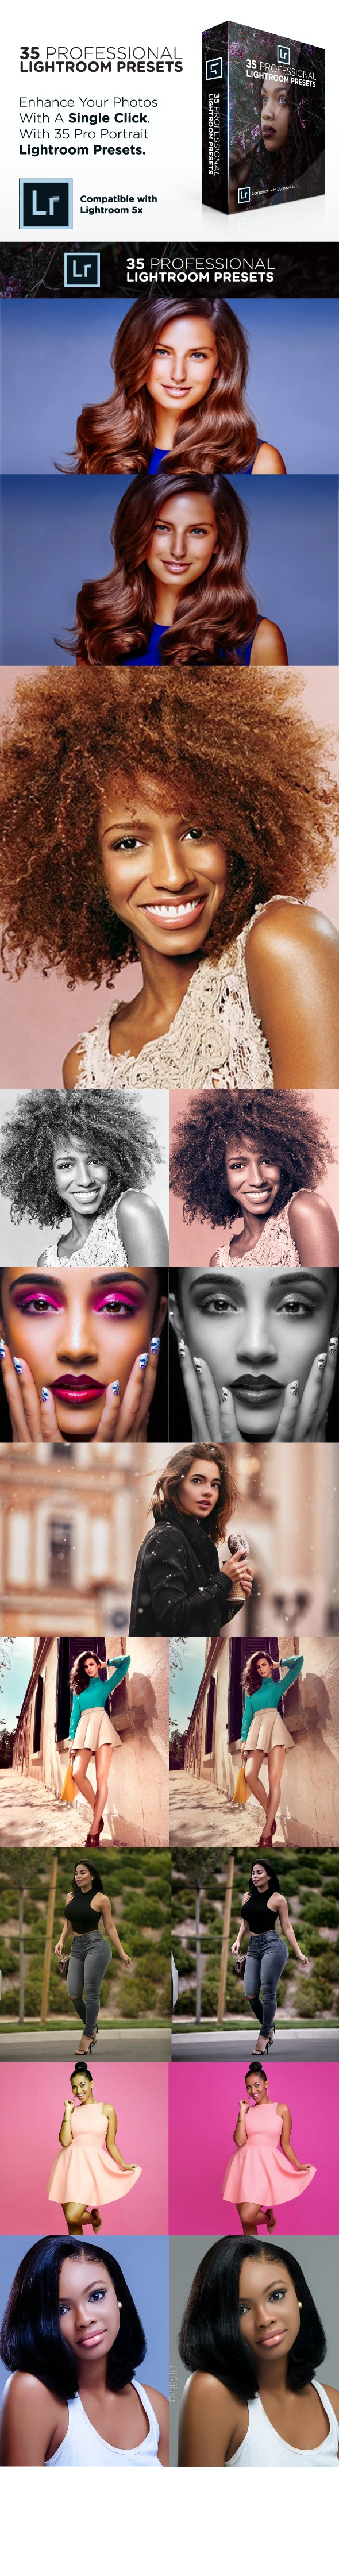 35 Professional Portrait Lightroom Presets - Portrait Lightroom Presets